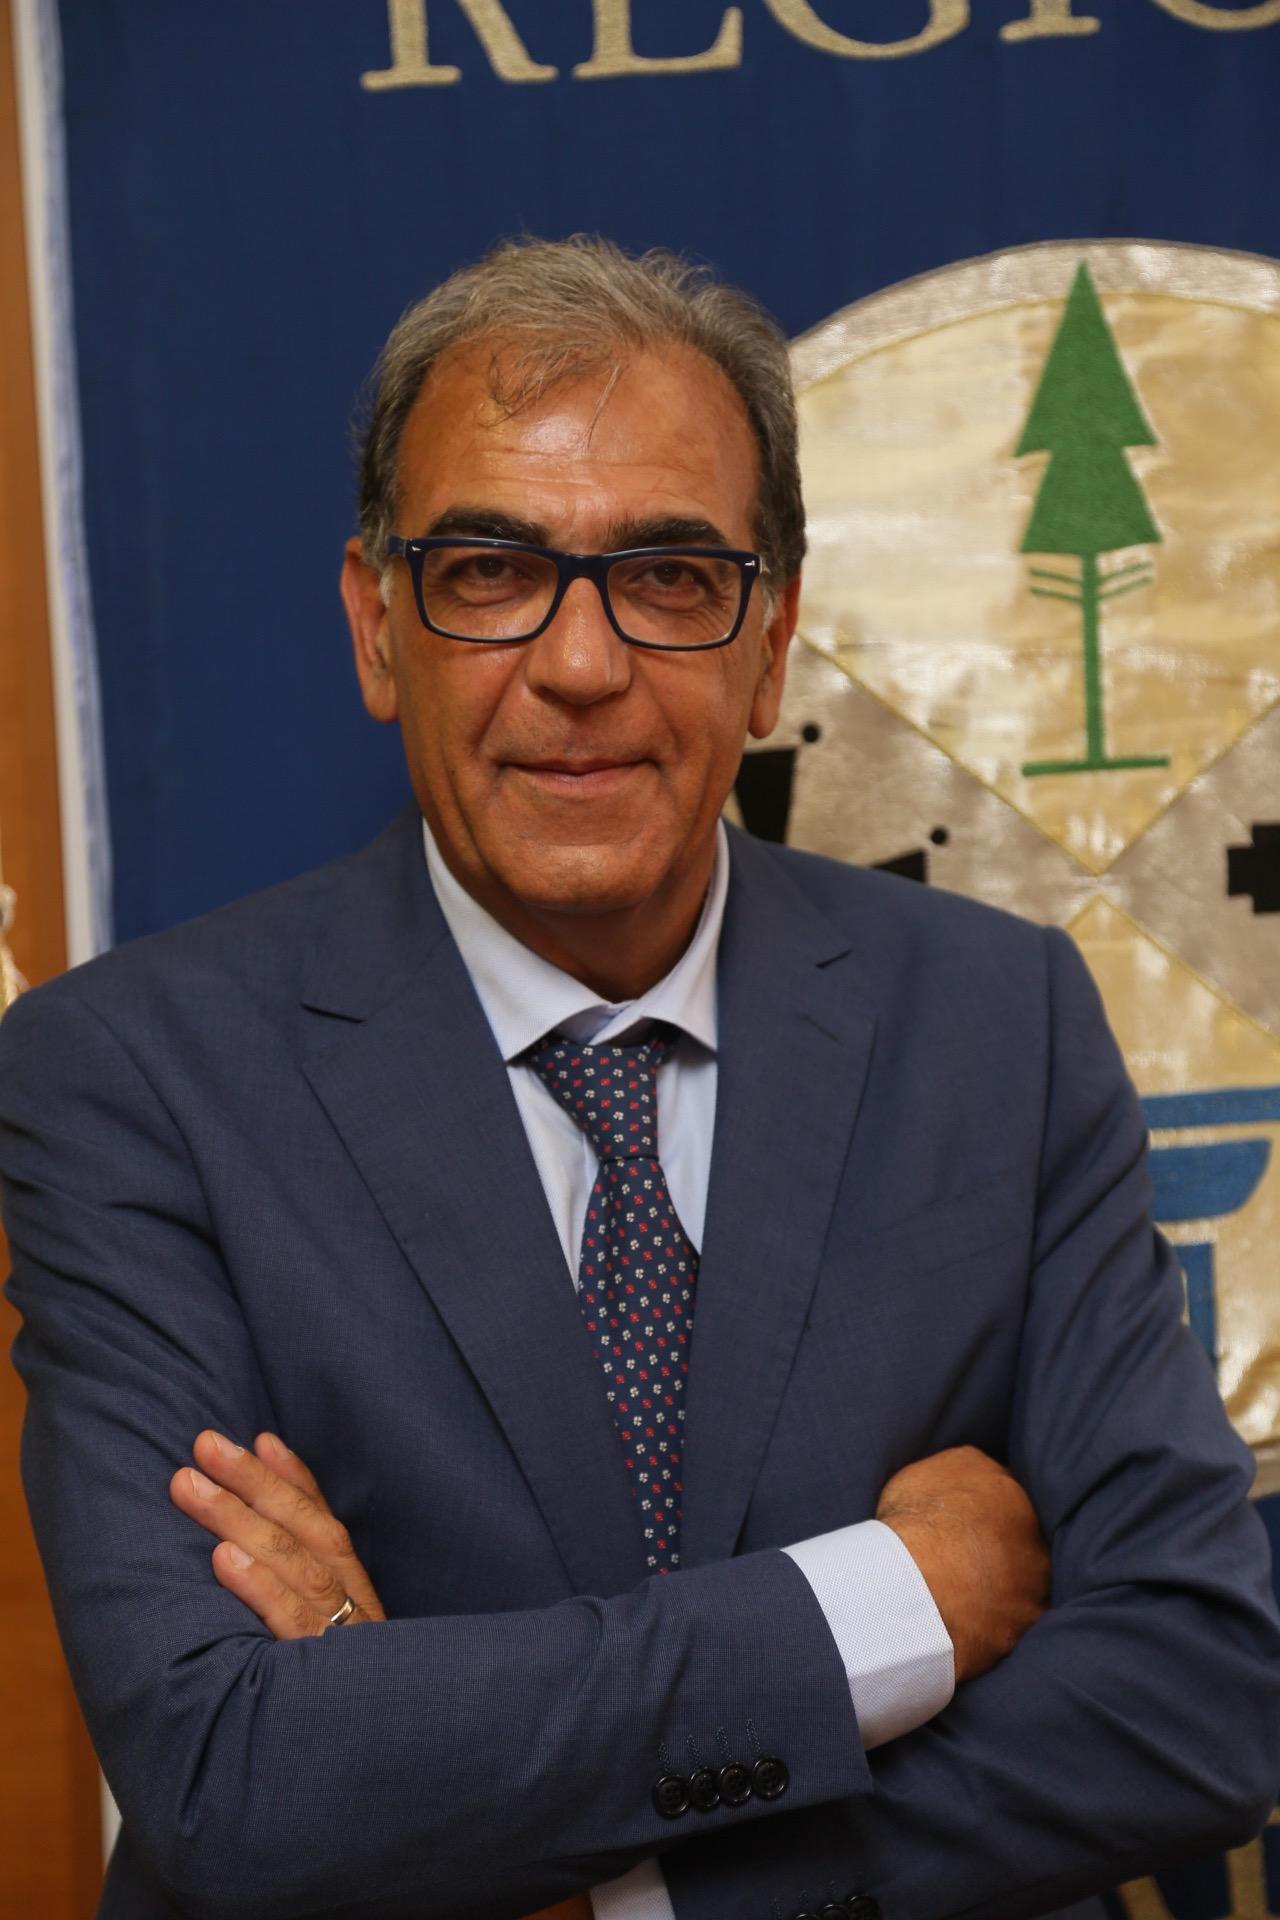 ANTONIO VISCOMI - Vicepresidente Giunta Regione Vibo Valentia